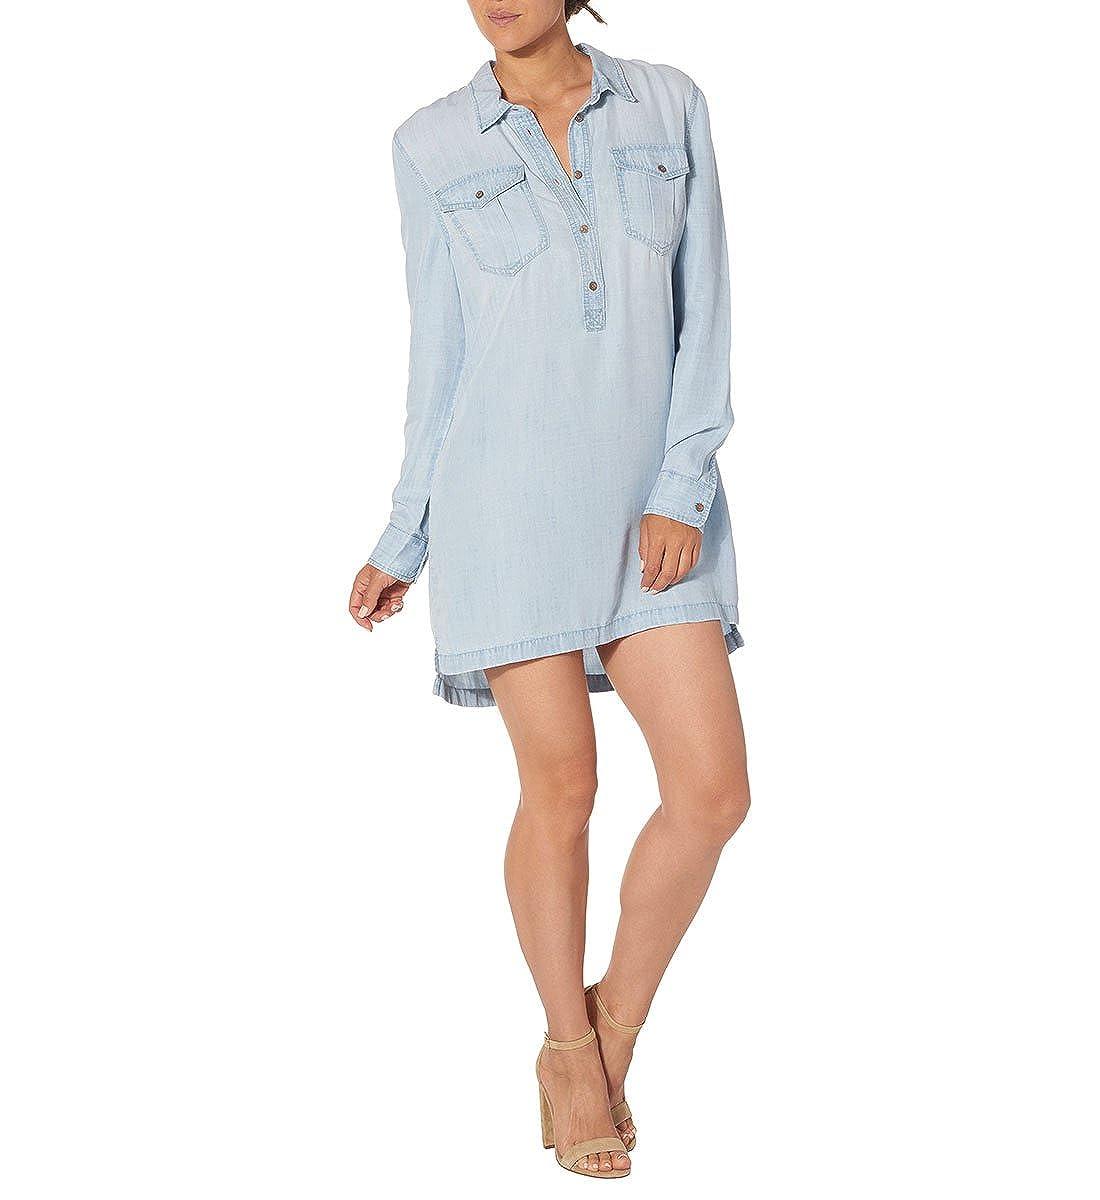 Silver Jeans Co Denim Dress